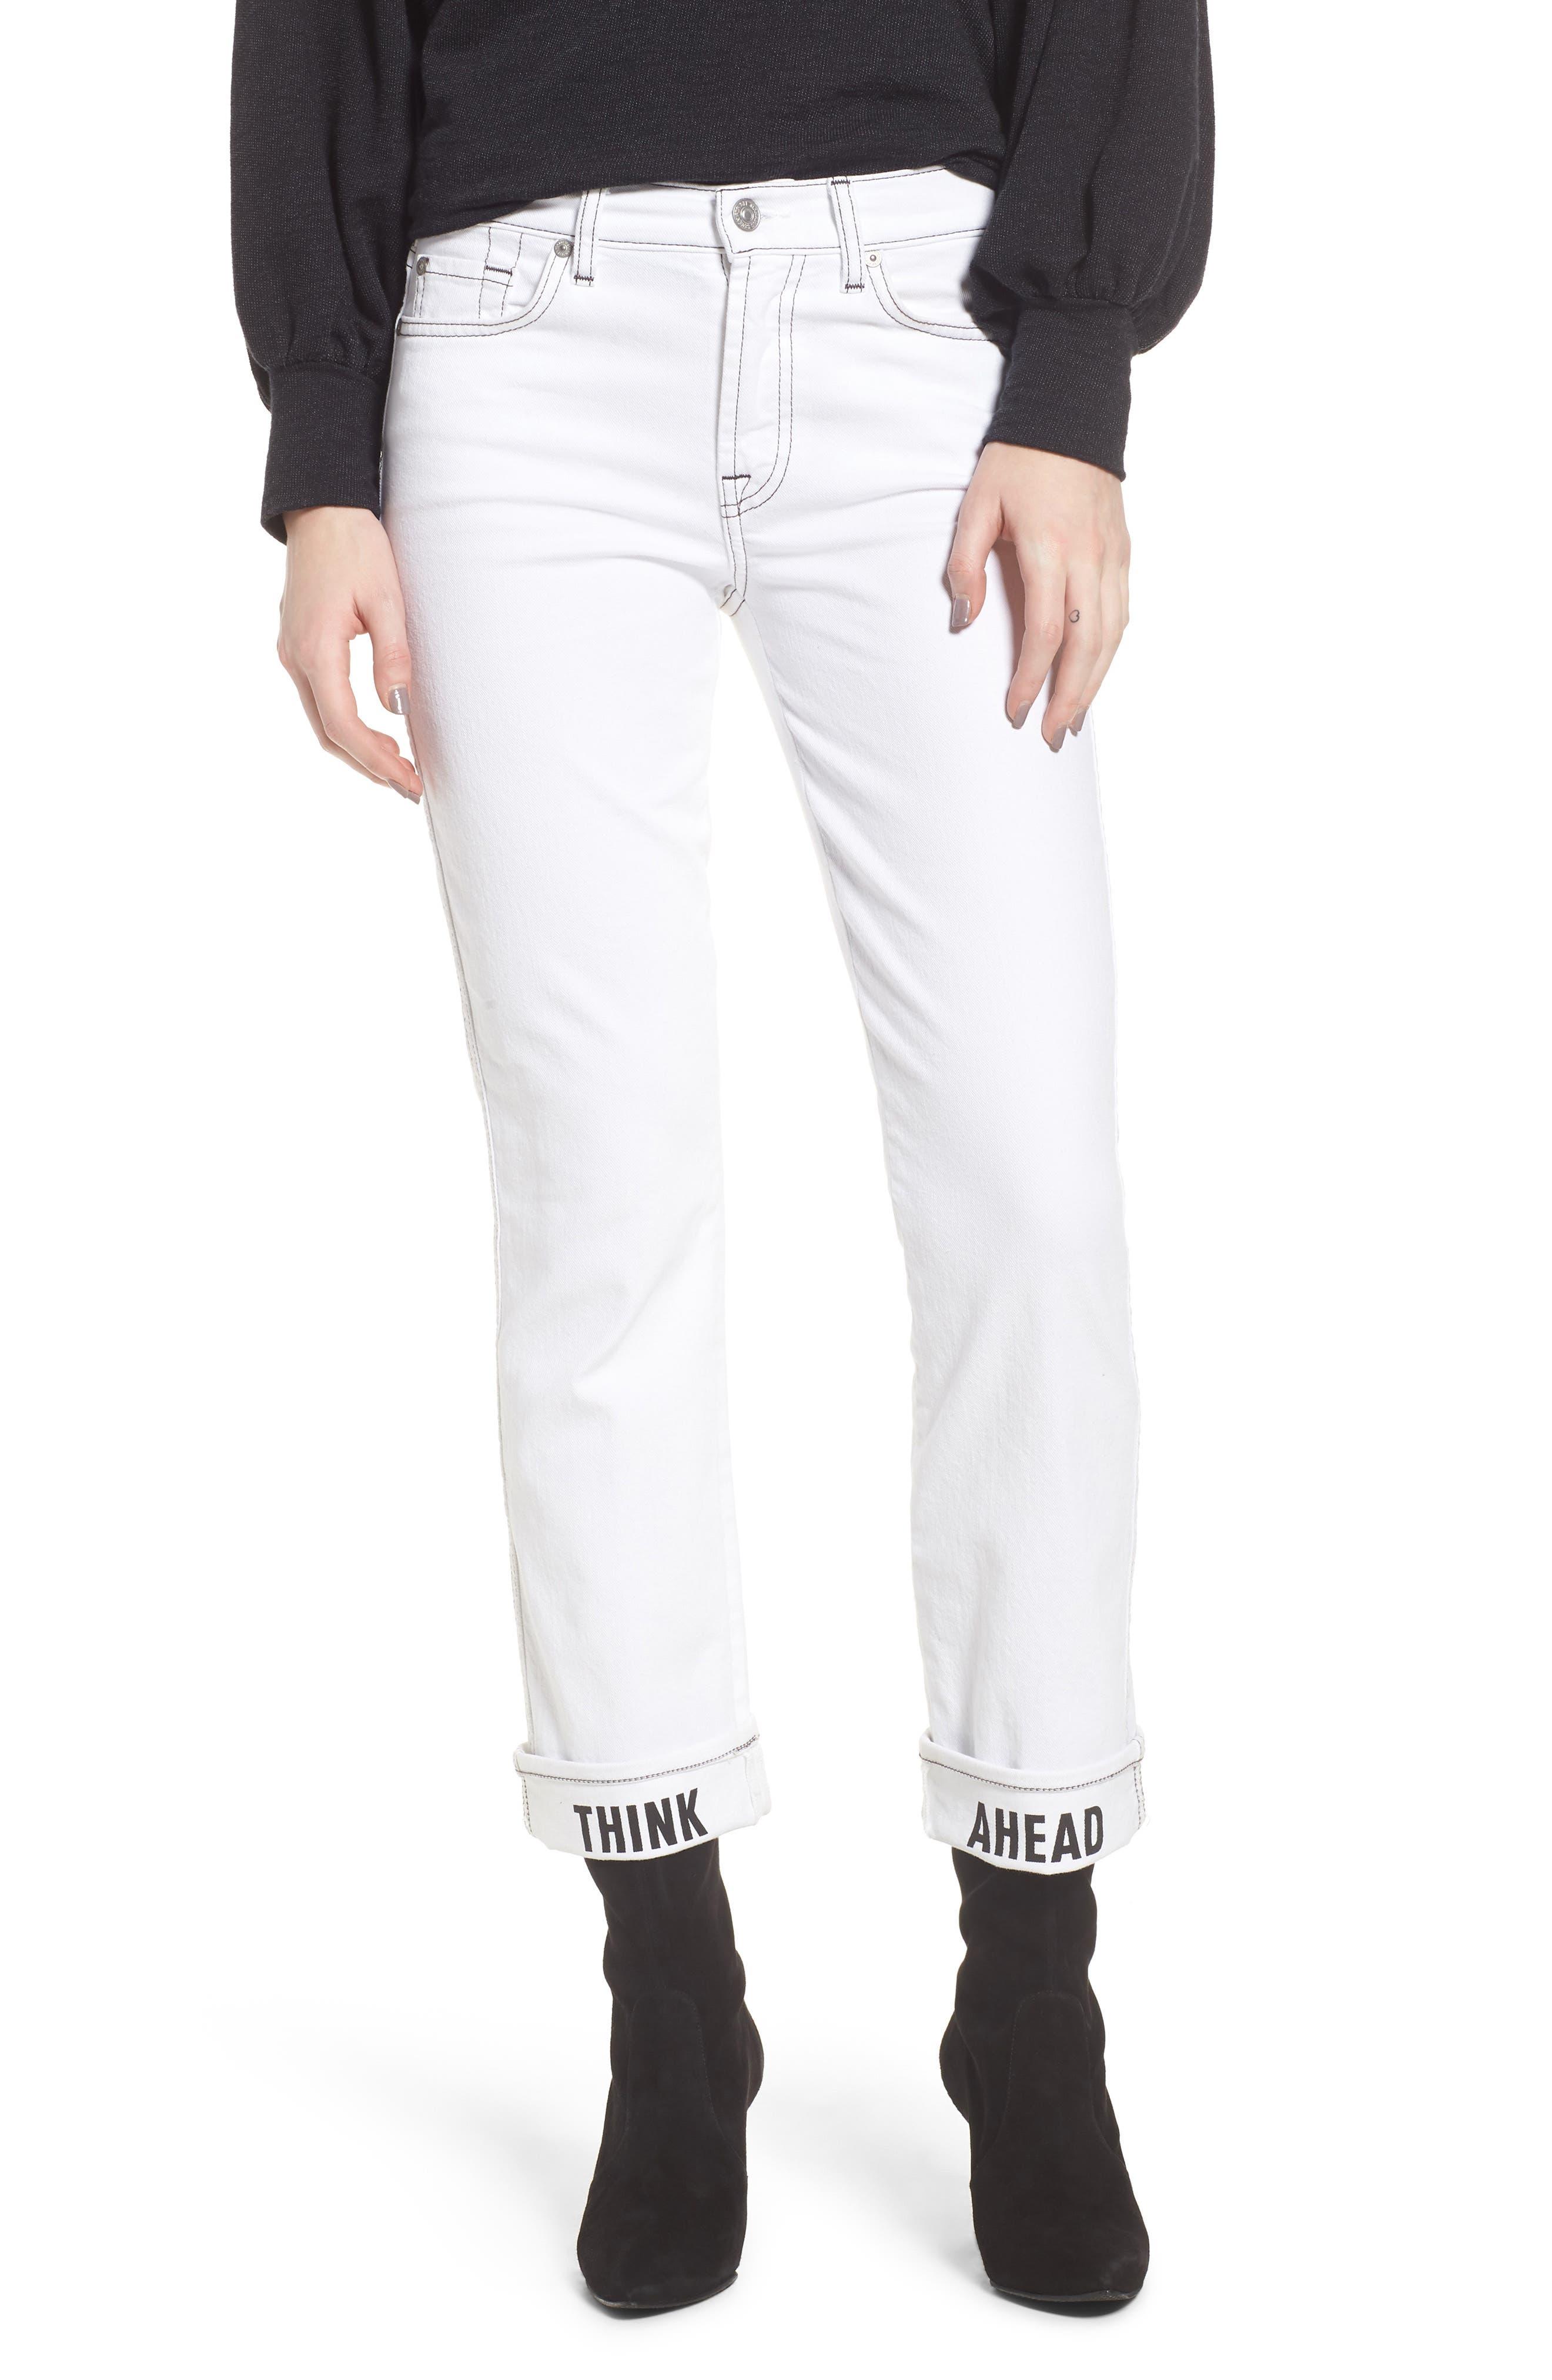 Dylan Print Cuff Straight Leg Jeans,                             Main thumbnail 1, color,                             White Fashion W/ Black Print